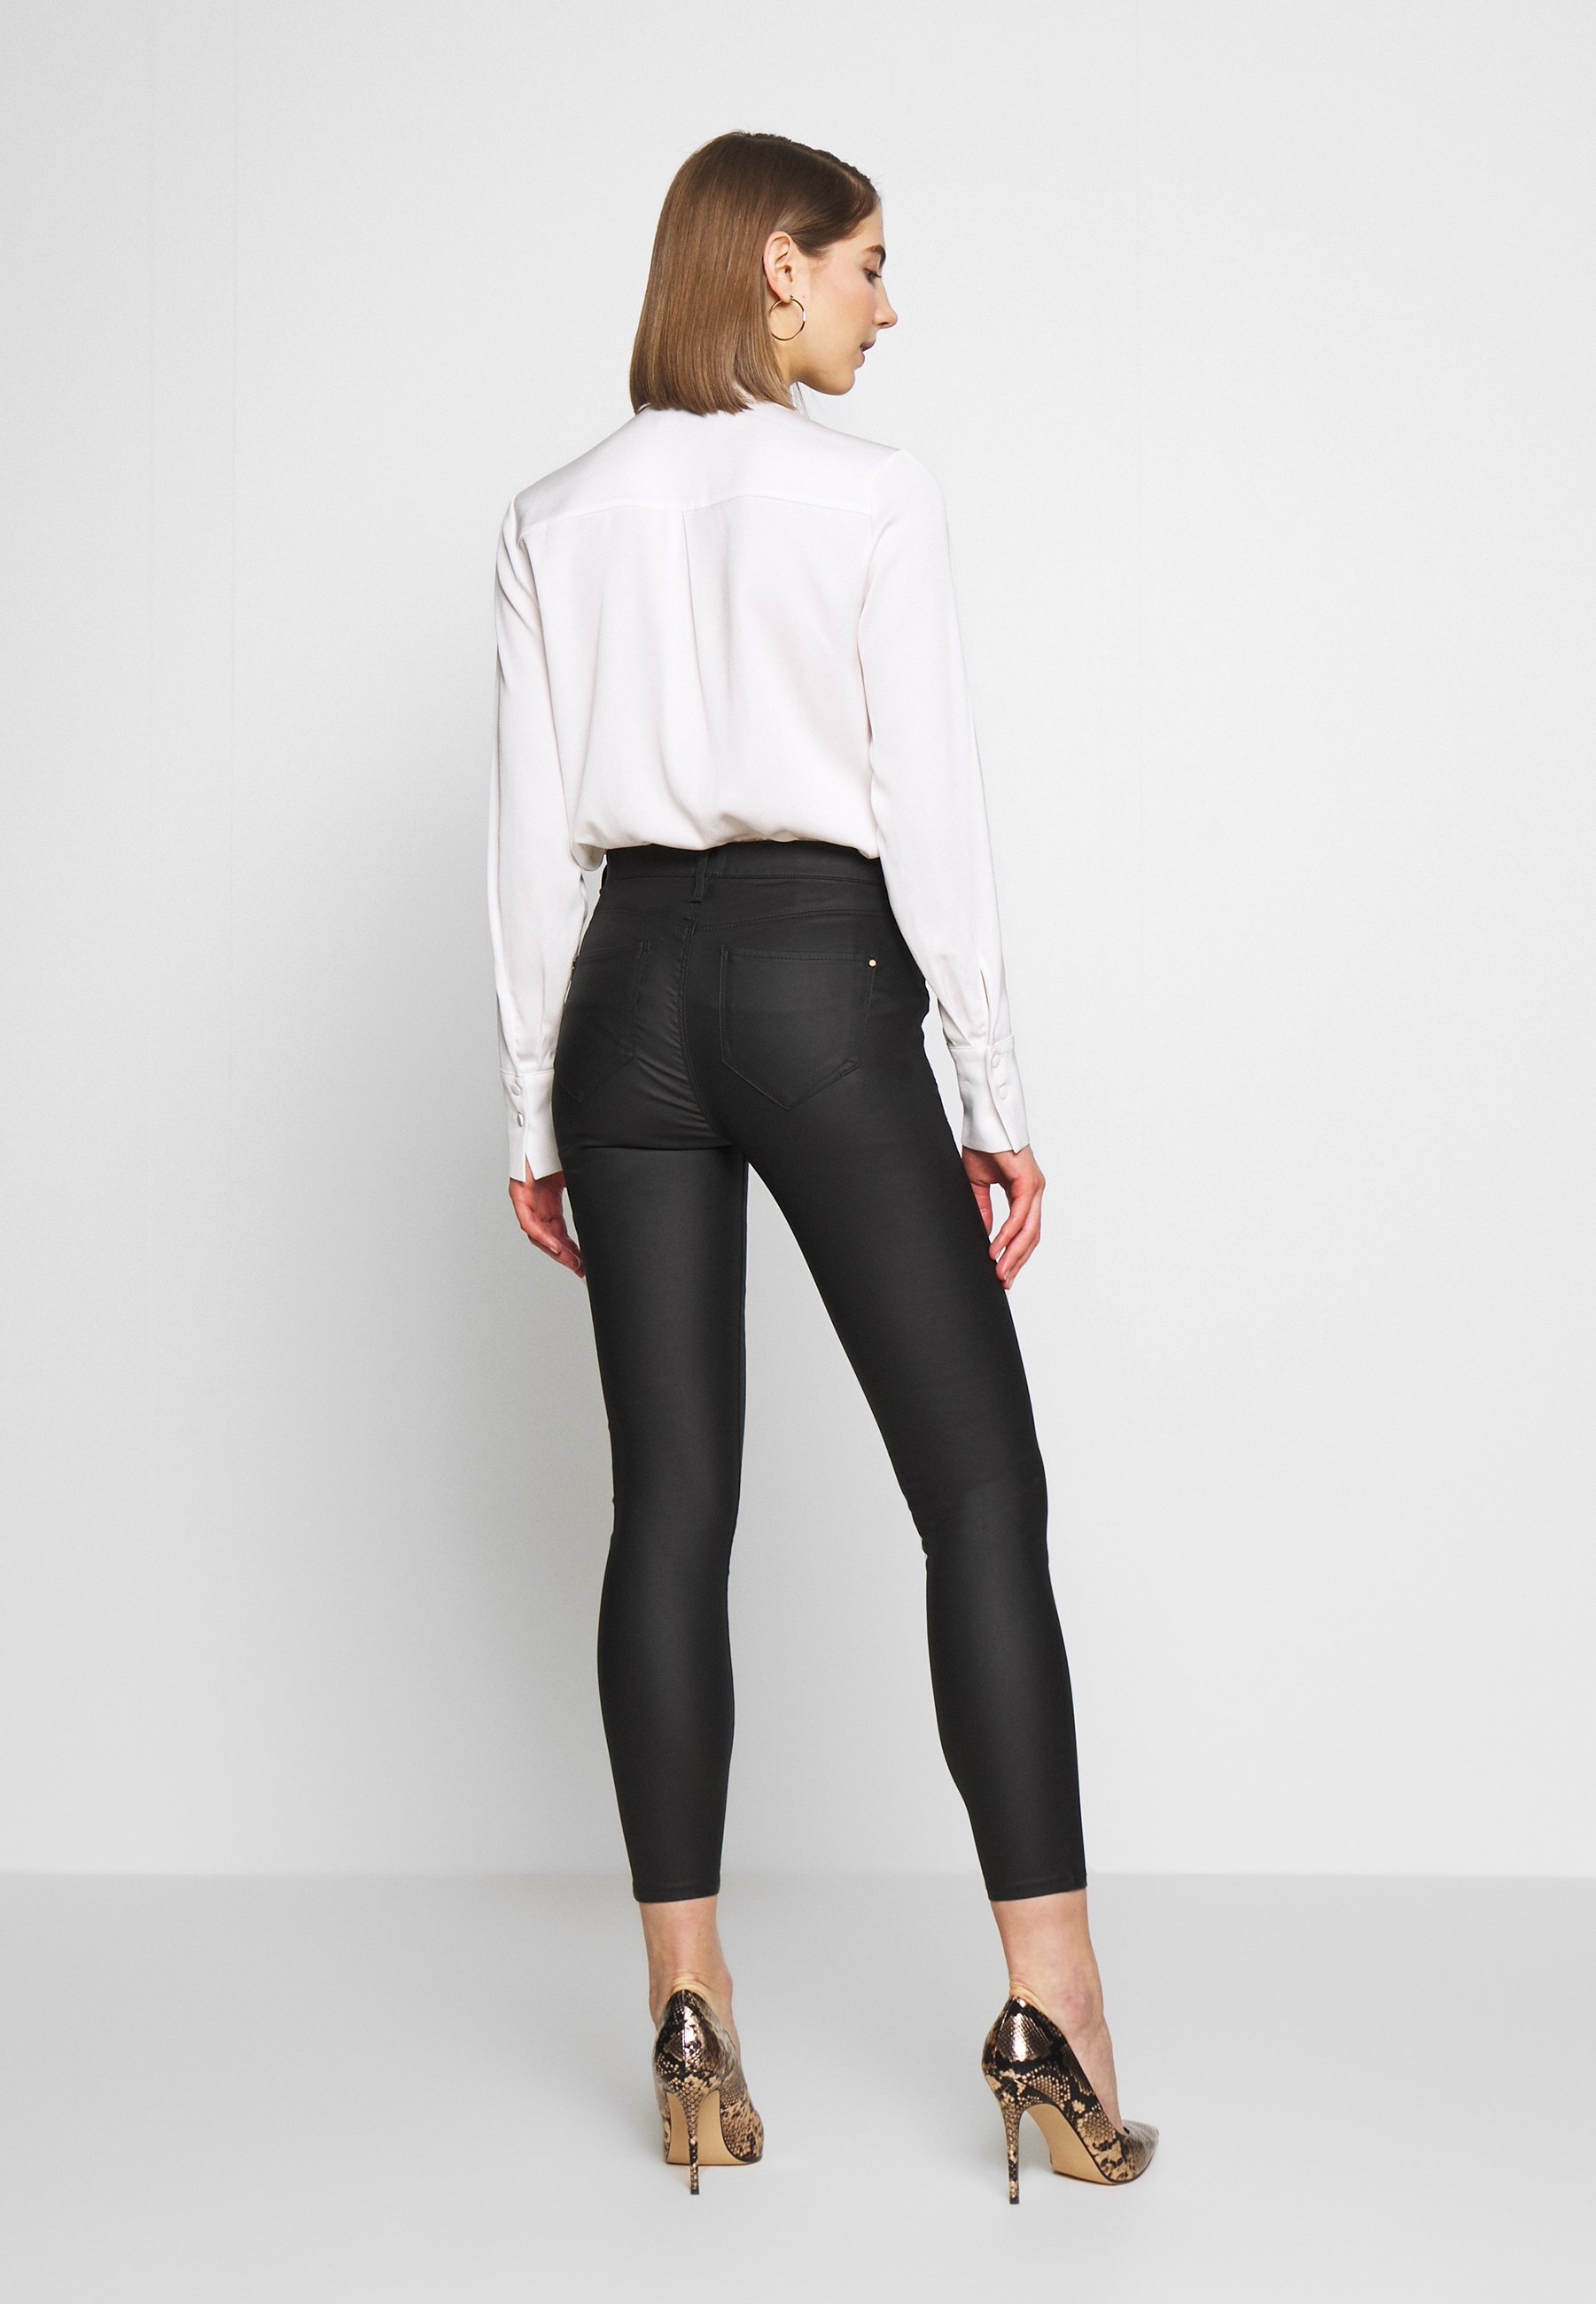 River Island MOLLY - Jeans Skinny - black - Jeans Femme OOSyQ